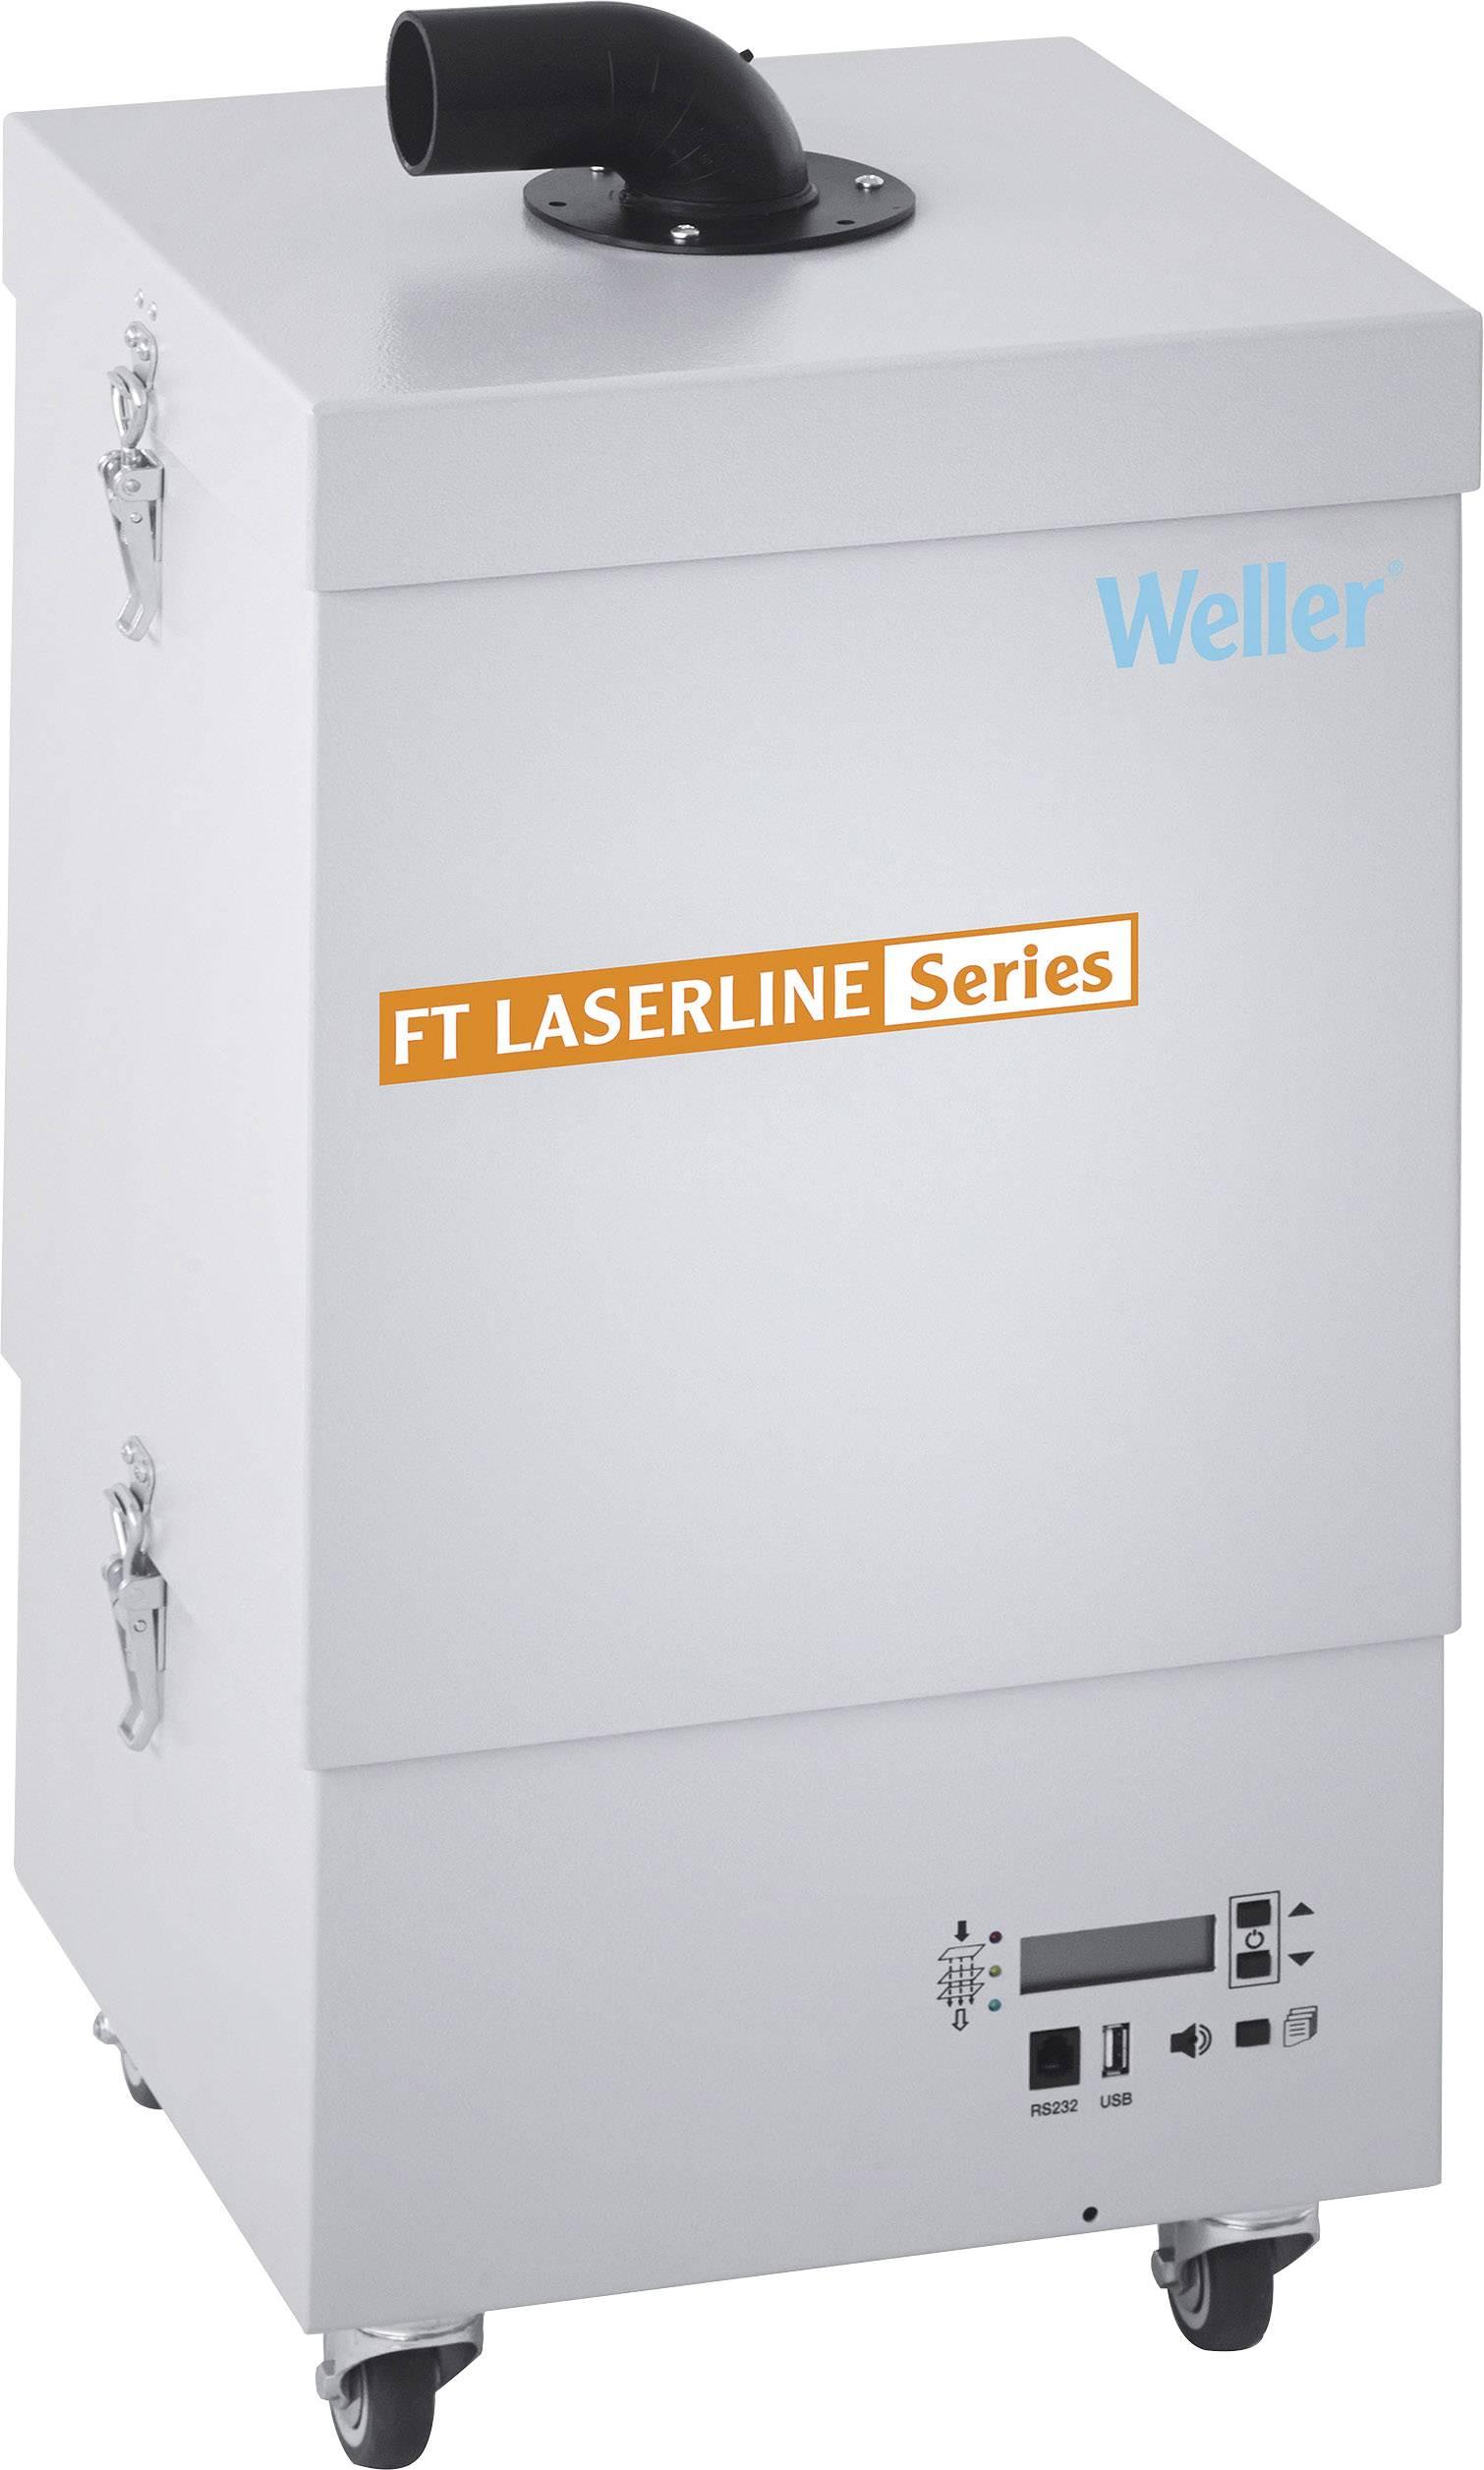 Odsávač dymu pri spájkovaní Weller Professional FT91001699N, 200 VA, 230 m³/h